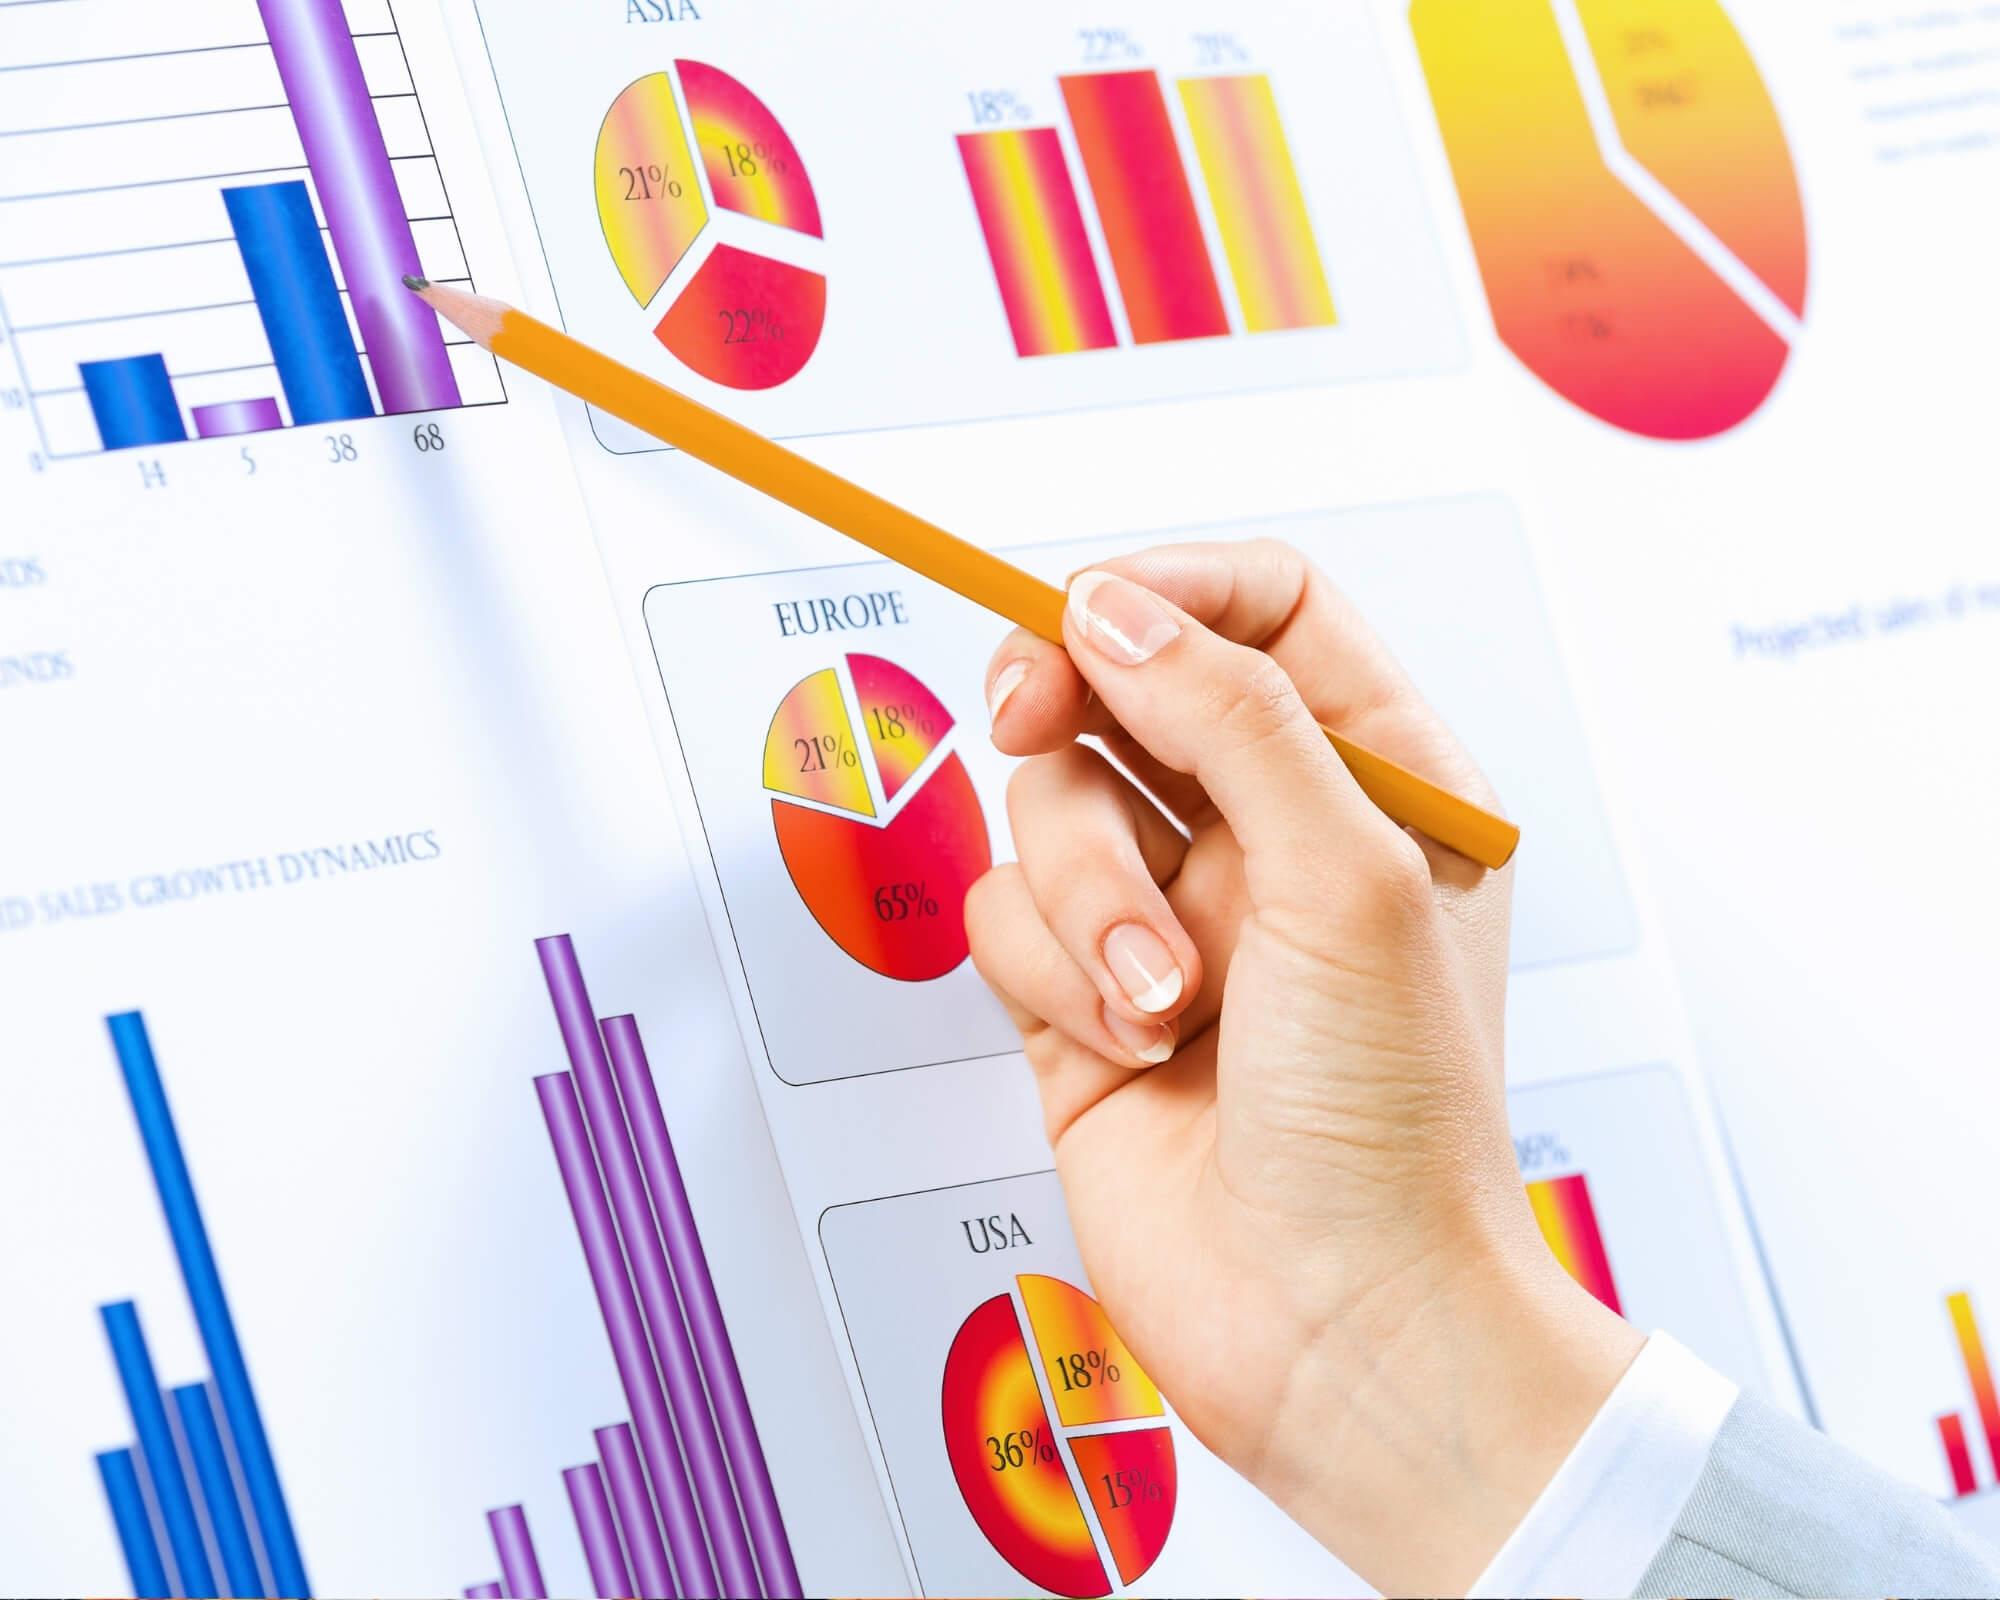 análisis de competencia como estrategia e-commerce